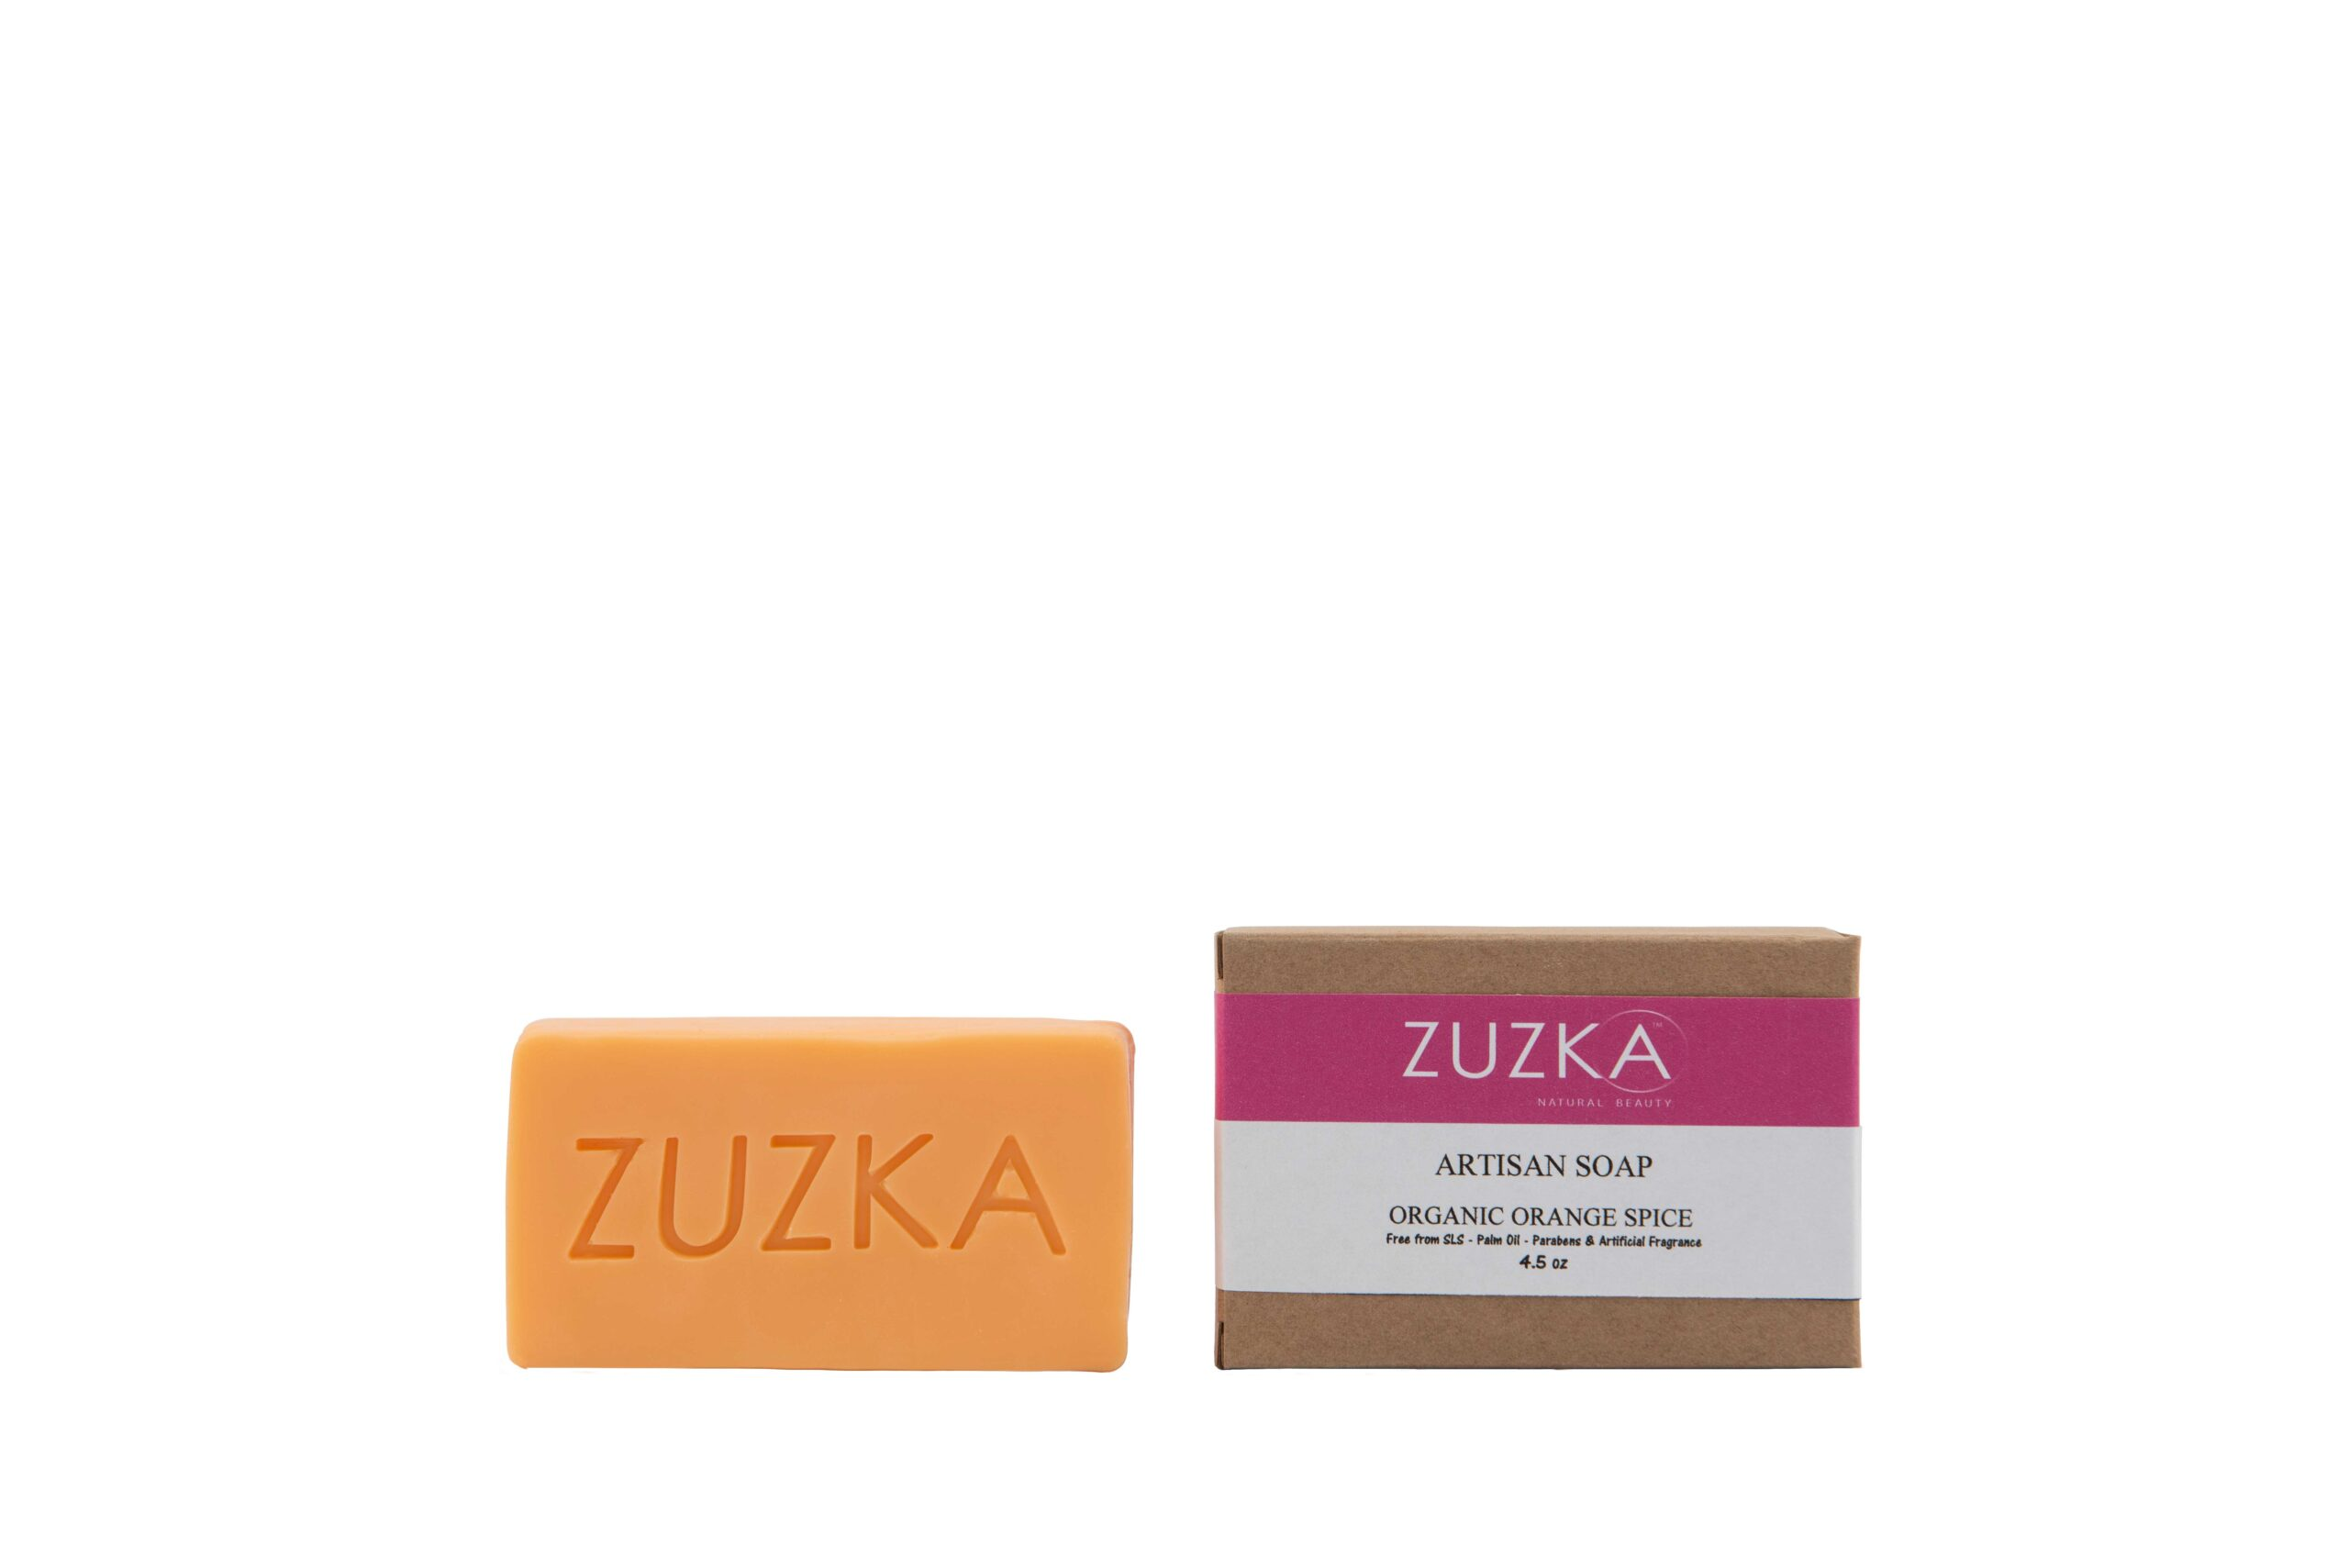 Zuzka-Artisan-Soap-Organic-Orange-Spice with Box